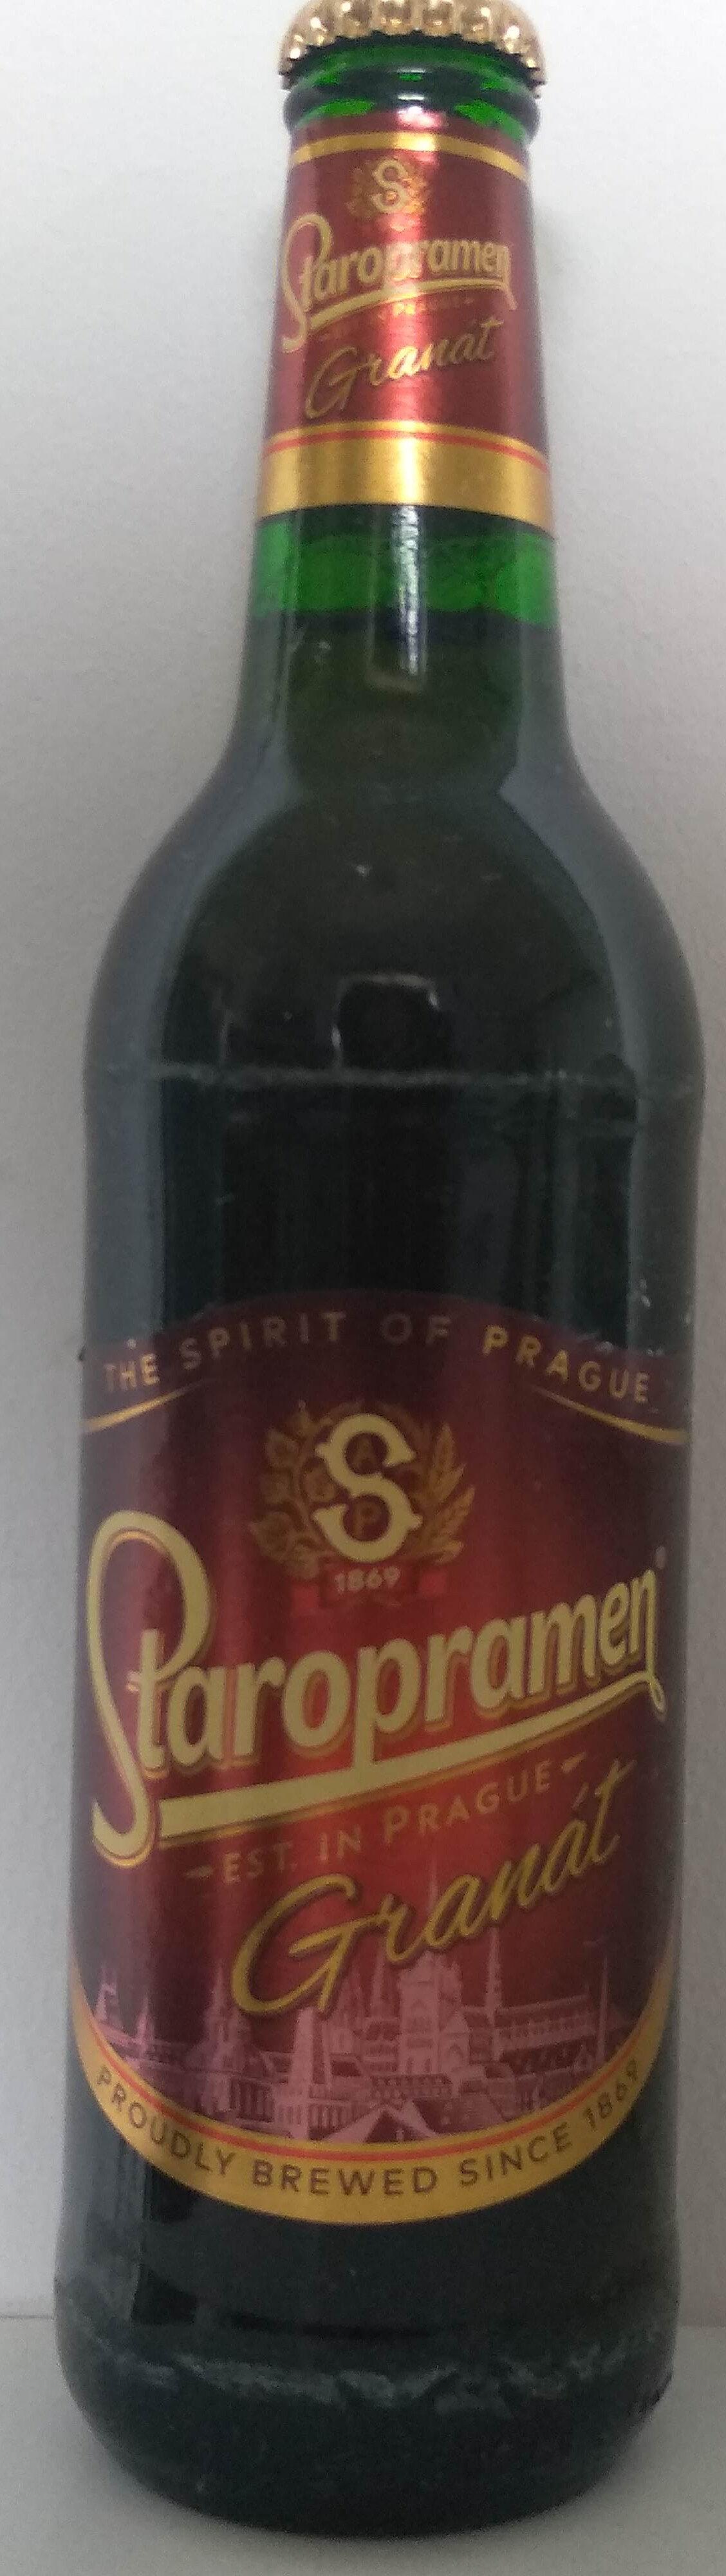 Staropramen Granát - Produit - hu